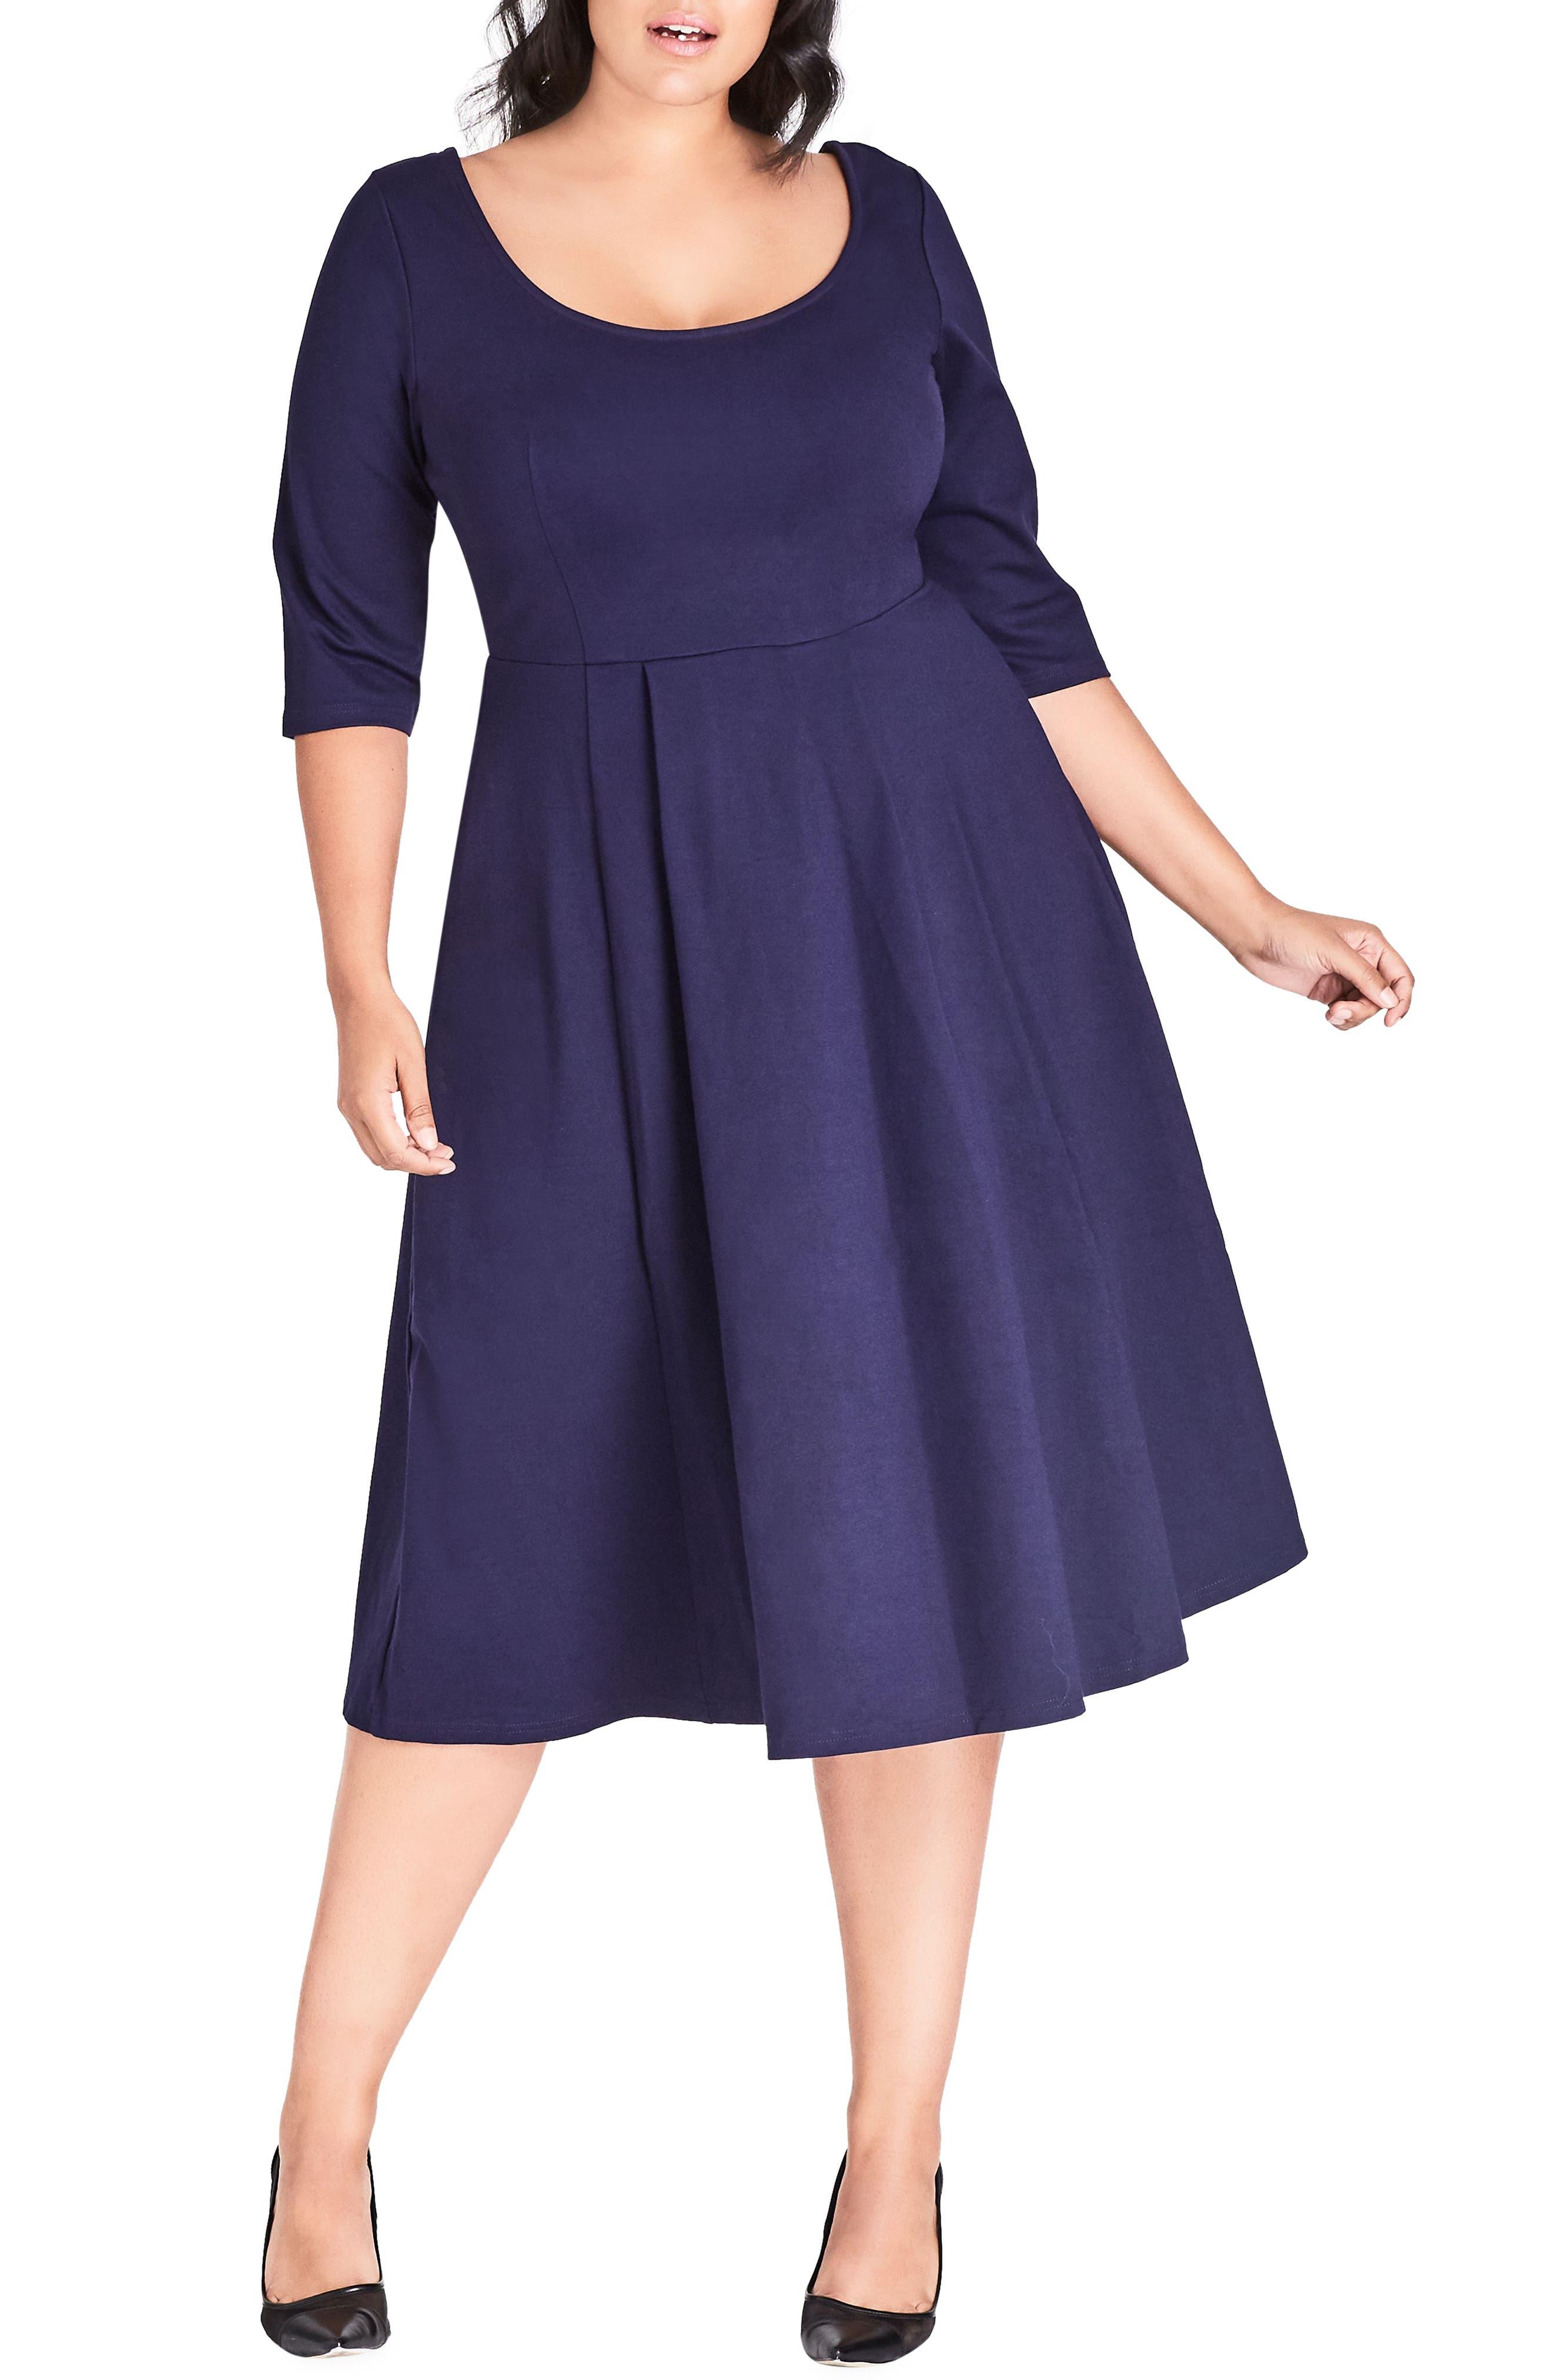 Scoop Neck A-Line Dress, Main, color, NAVY